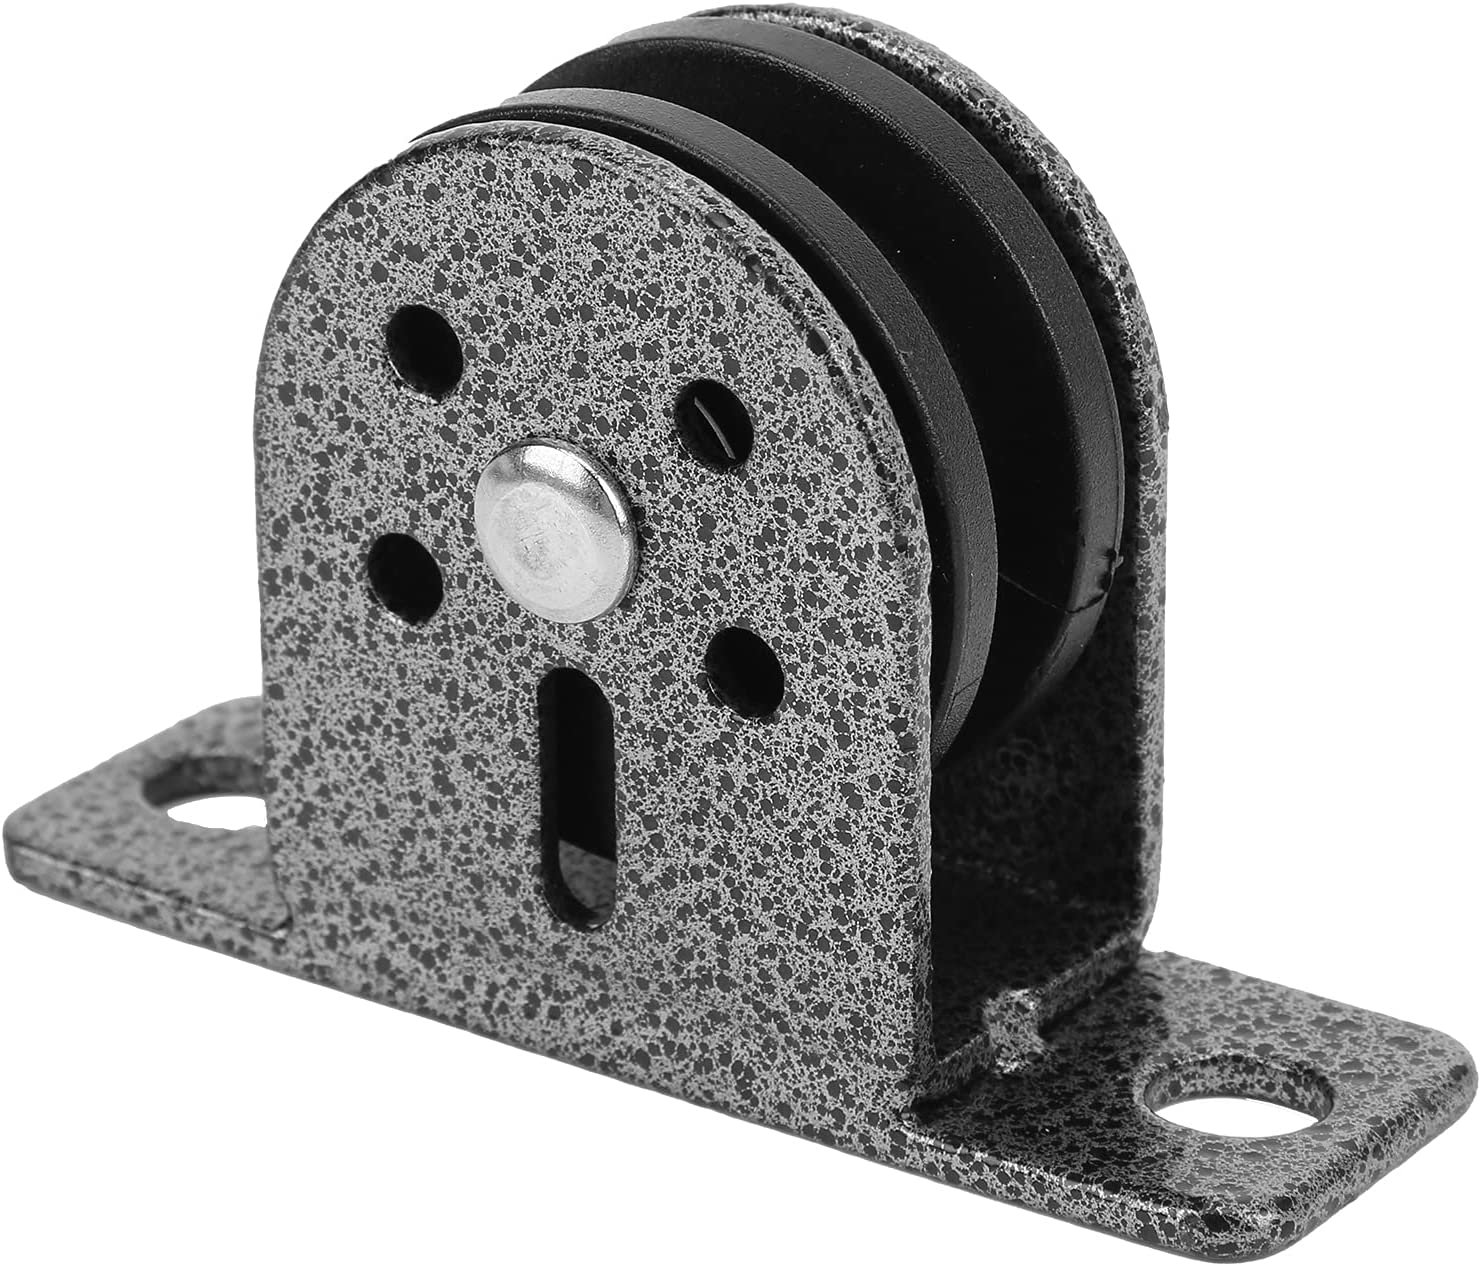 Solid Single Pulley Block 661.4lb cheap Bearing Max 90% OFF Capacity 300kg